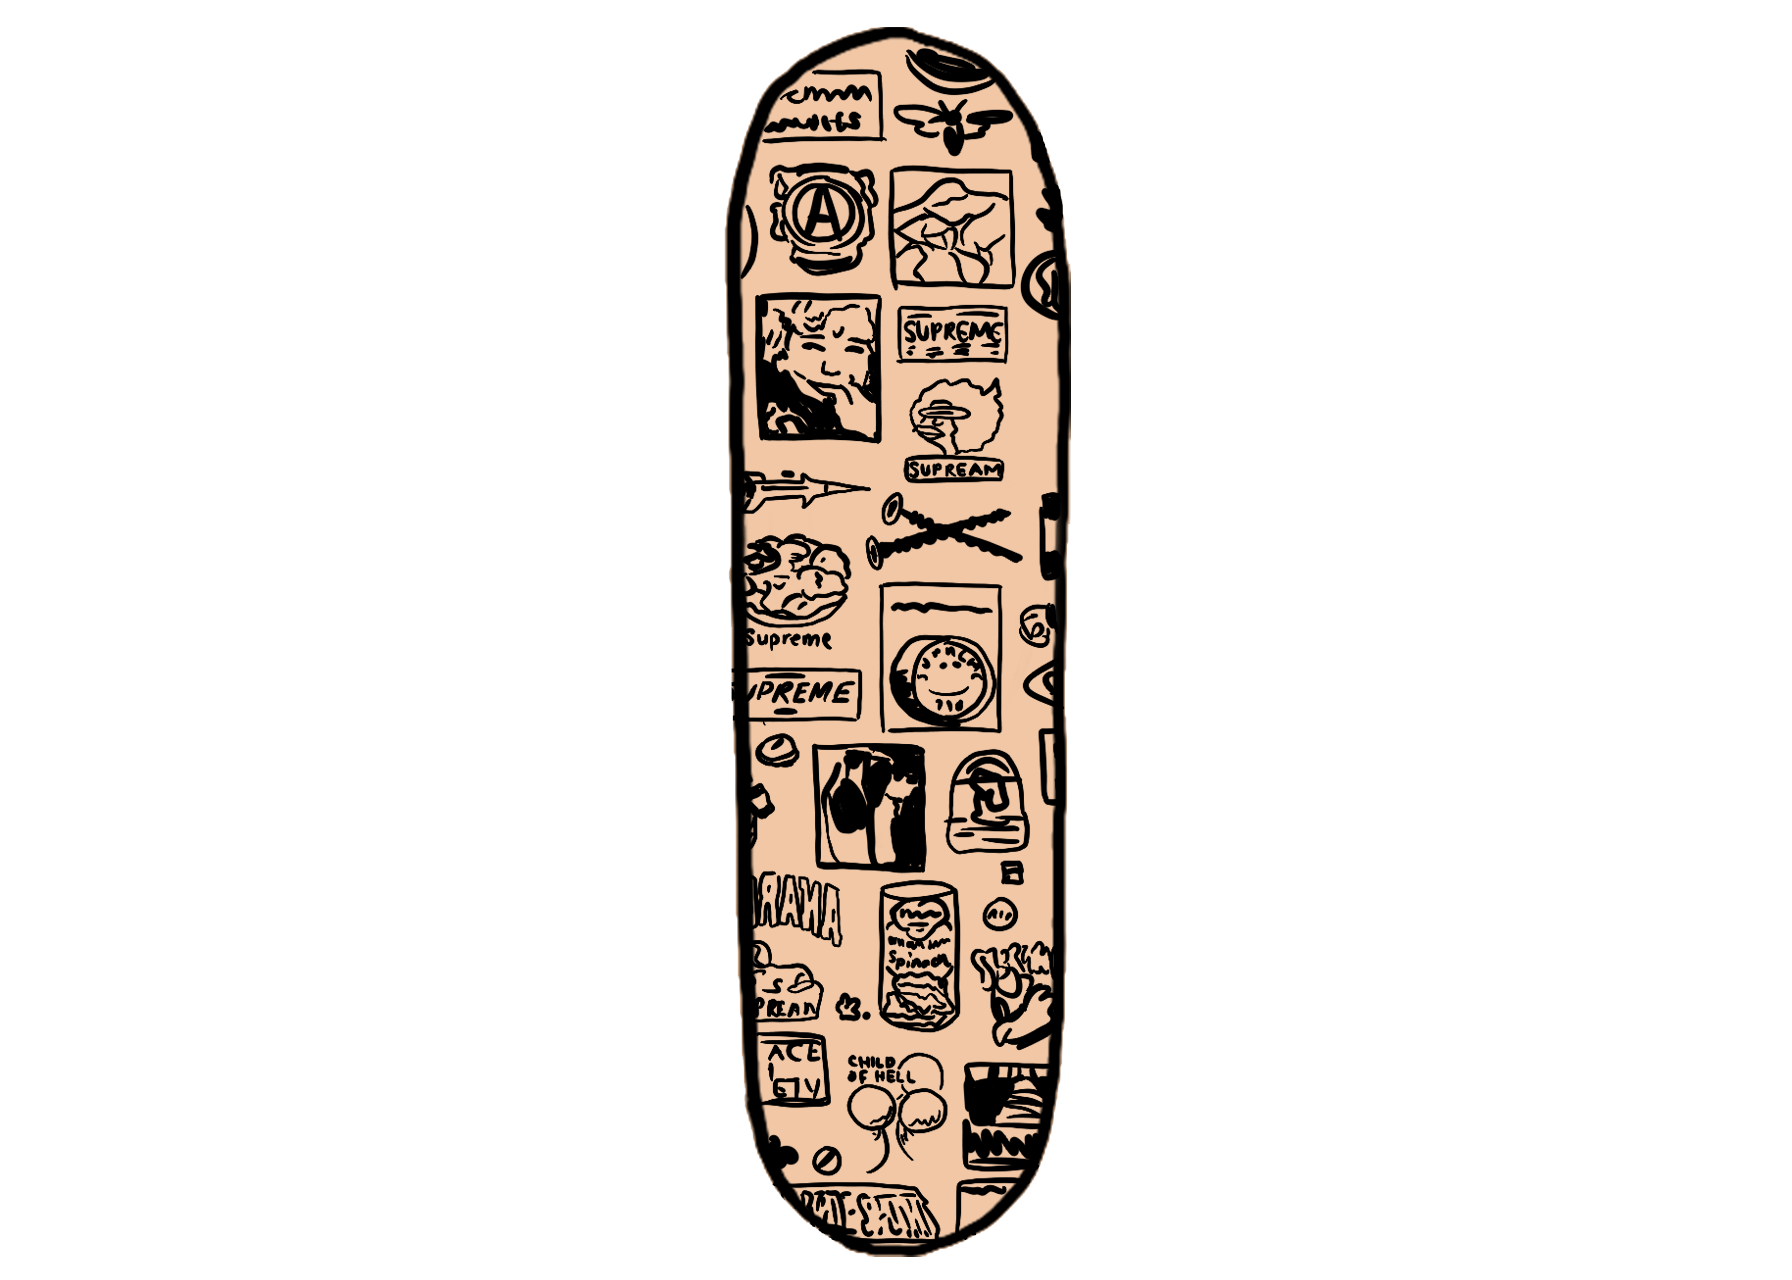 world famous supreme sticker supreme sticker skate sticker